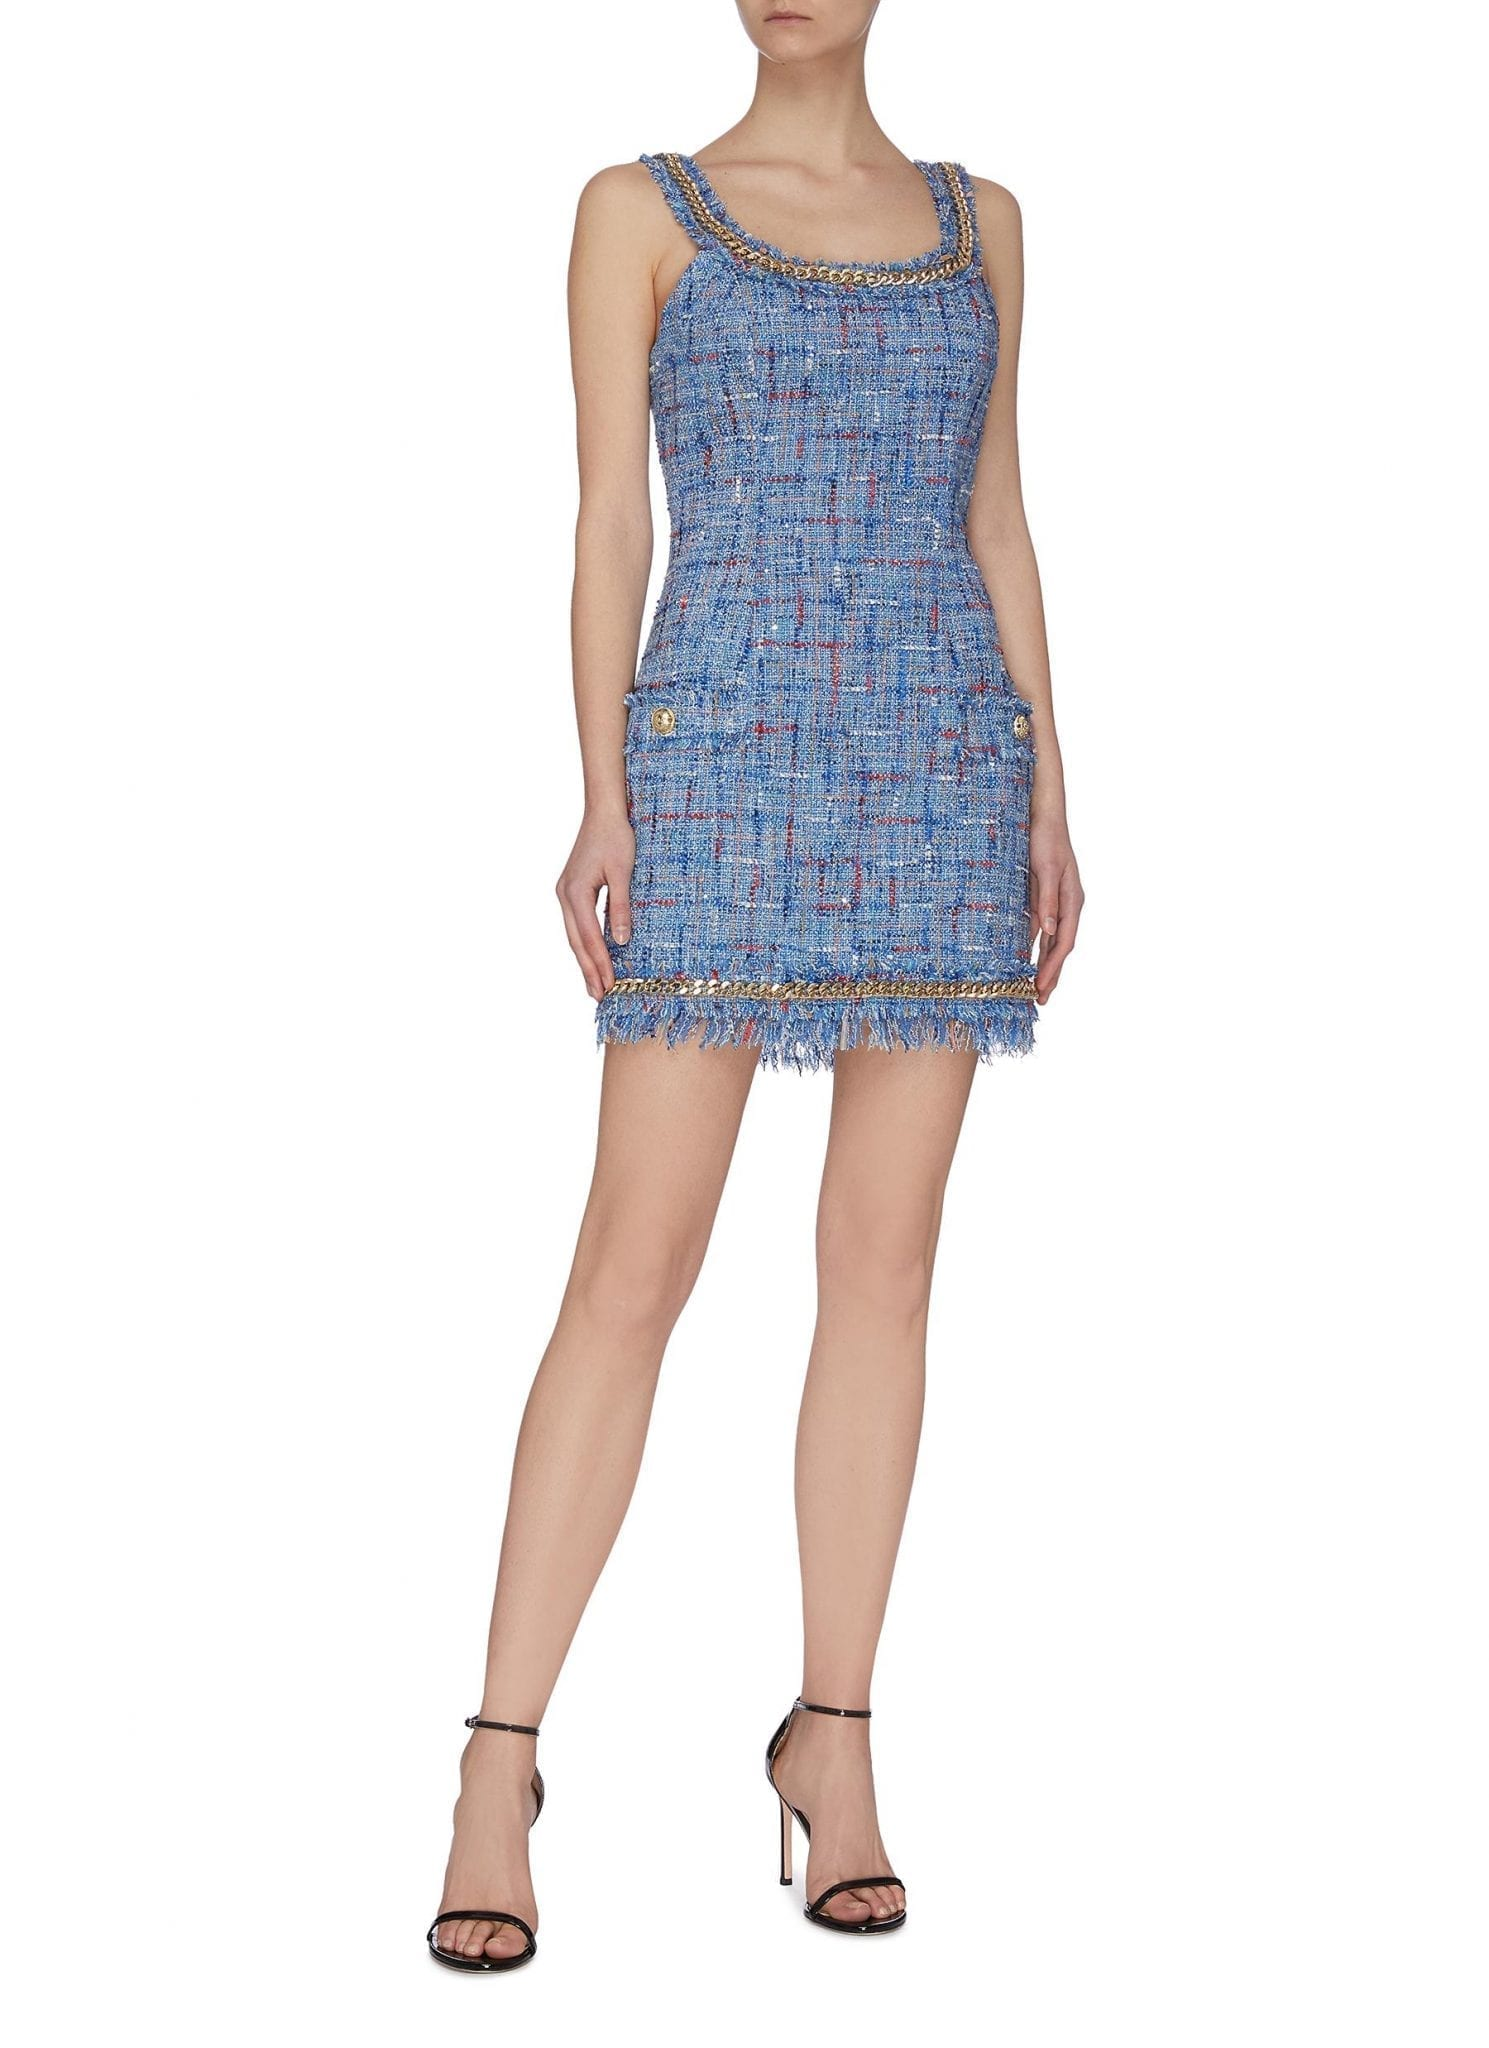 BALMAIN Fringe Tweed Denim Dress